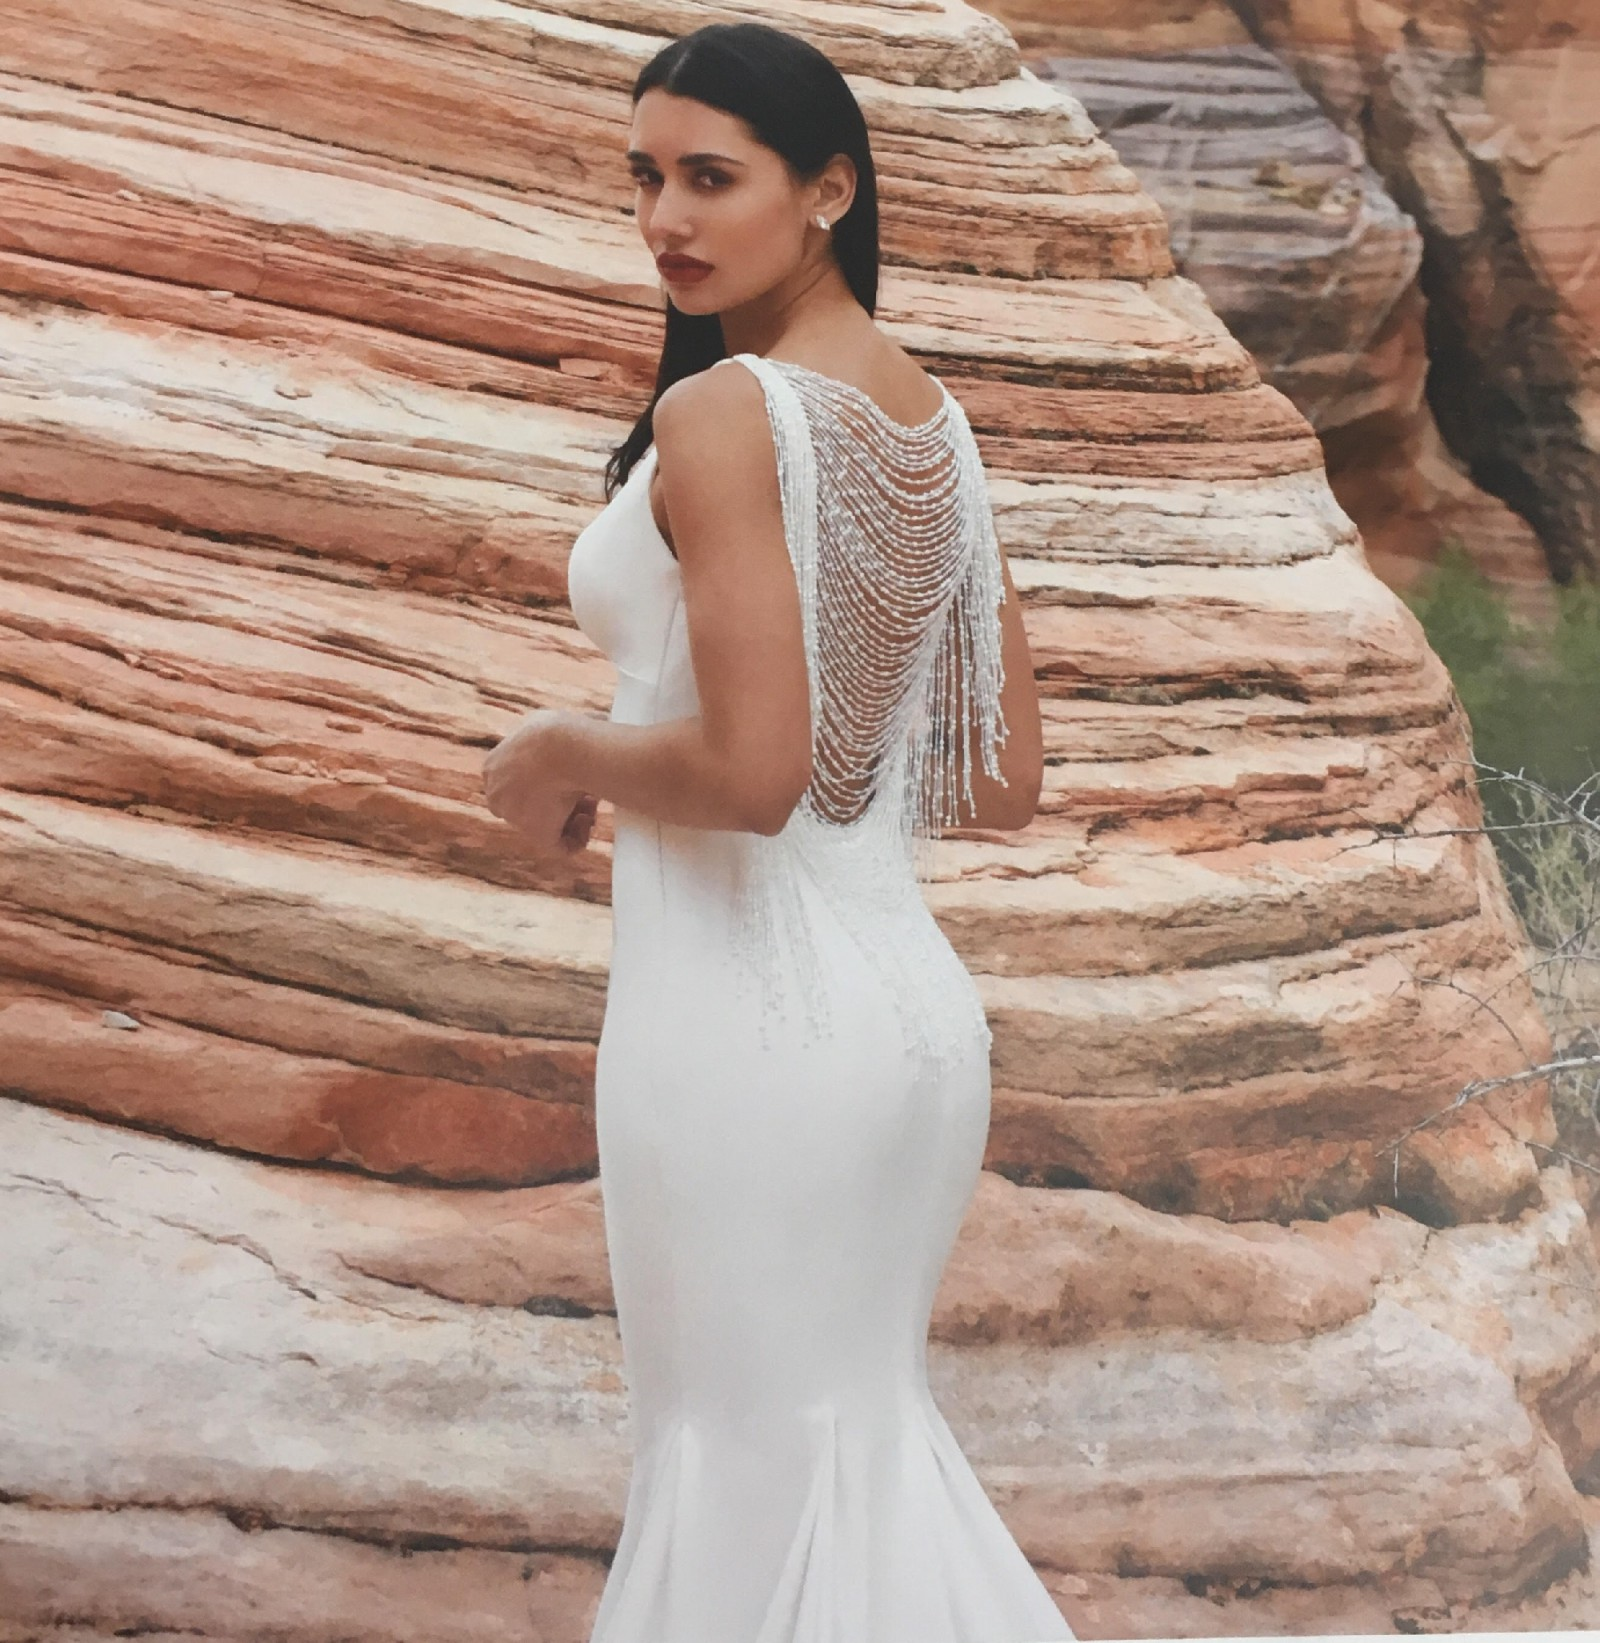 Wedding Gown London: Dando London Destiny New Wedding Dress On Sale 74% Off